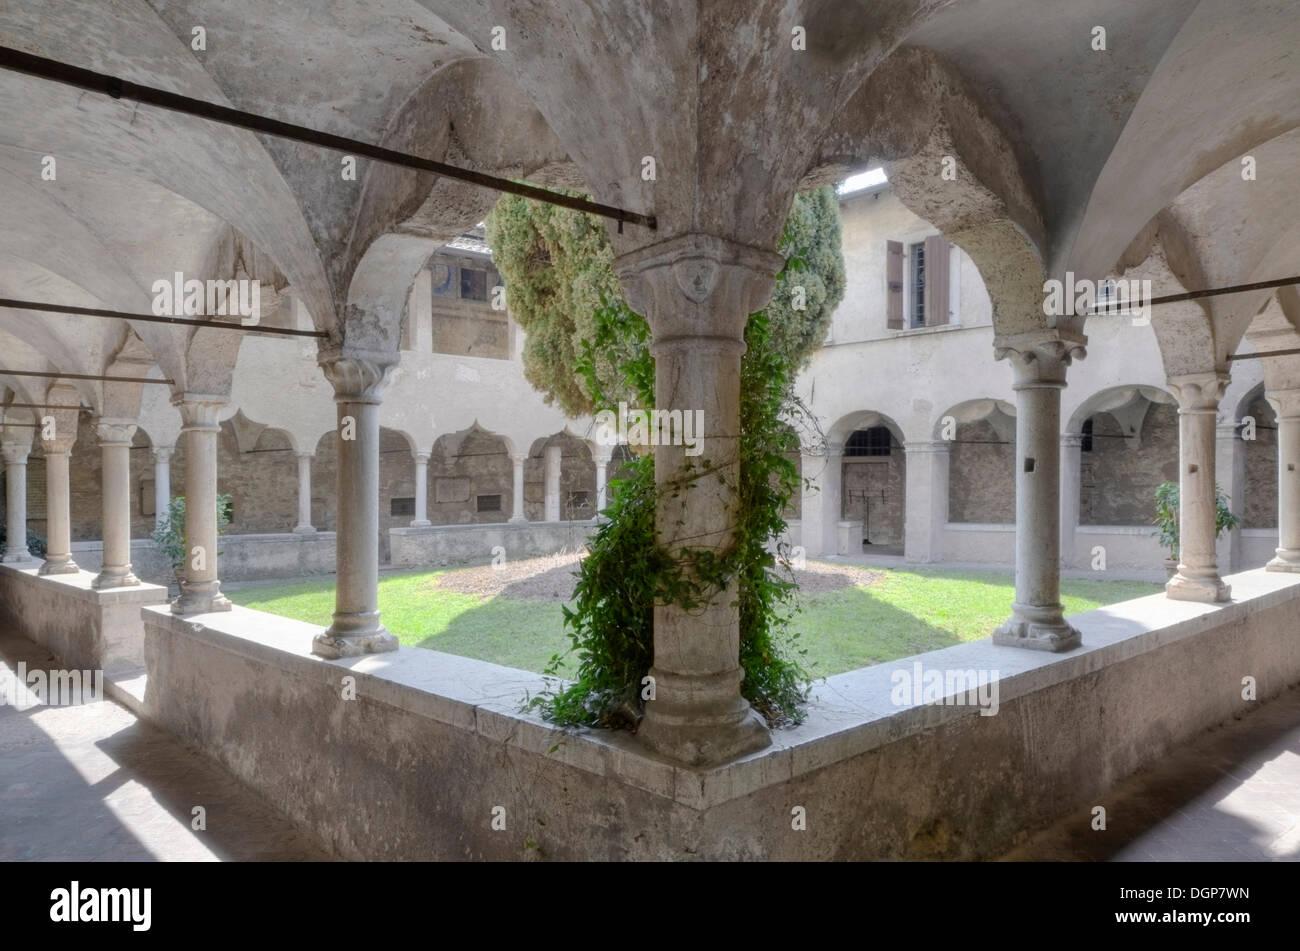 Arcade in the monastery of San Francesco in Gargnano, Lake Garda, Lombardy, Italy, Europe - Stock Image